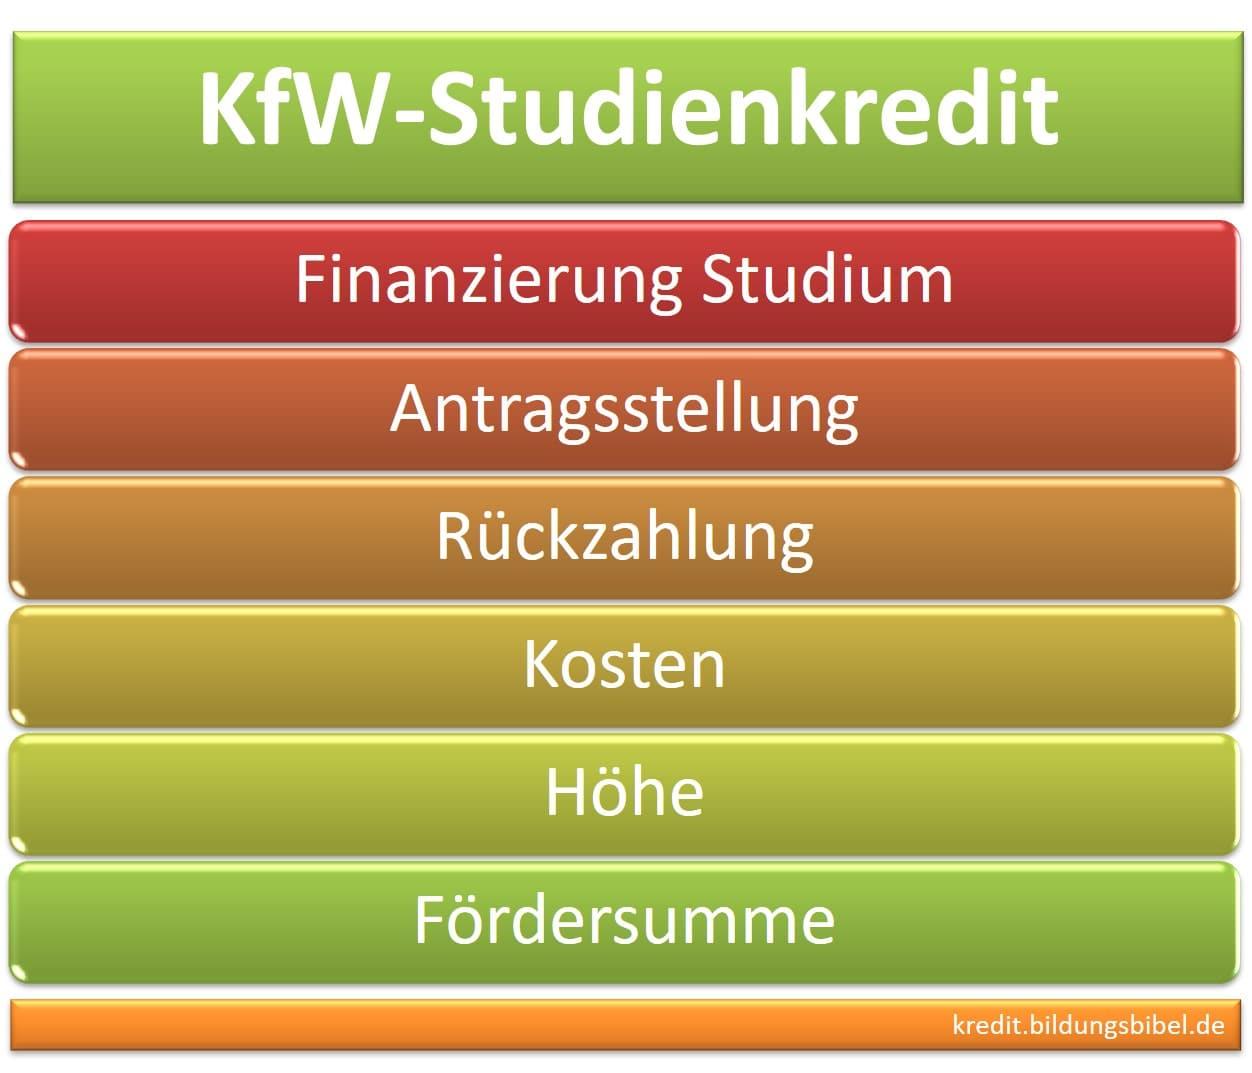 KfW Studienkredit zur Finanzierung Studium: Antragstellung, Rückzahlung, Antragsteller, Kosten, Höhe, Fördersumme.